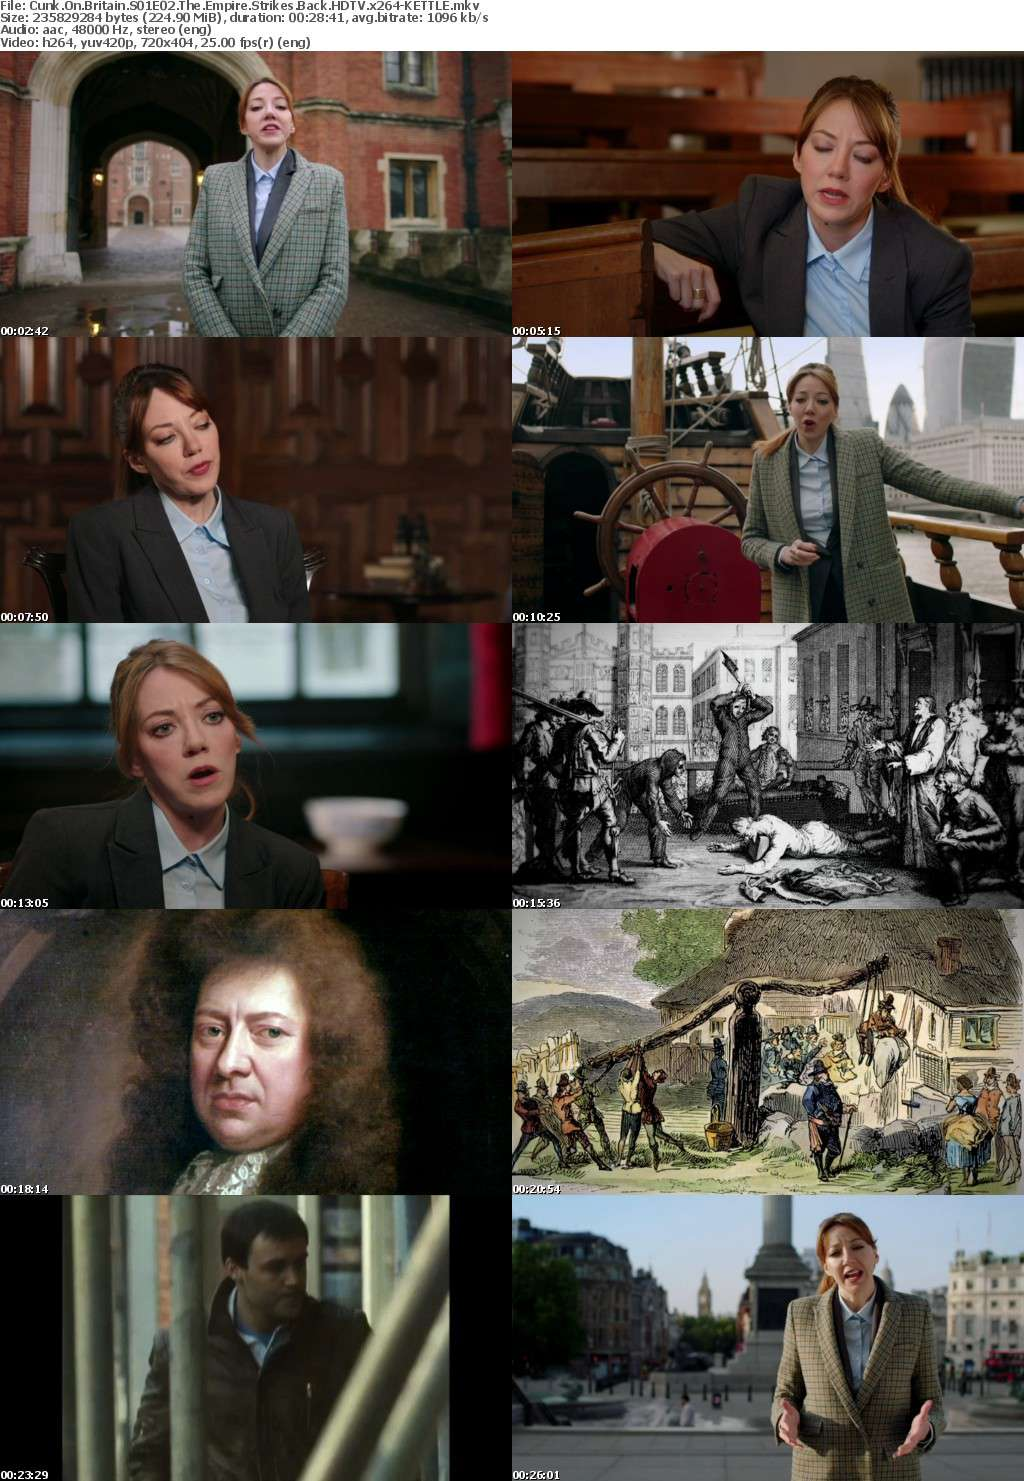 Cunk On Britain S01E02 The Empire Strikes Back HDTV x264-KETTLE